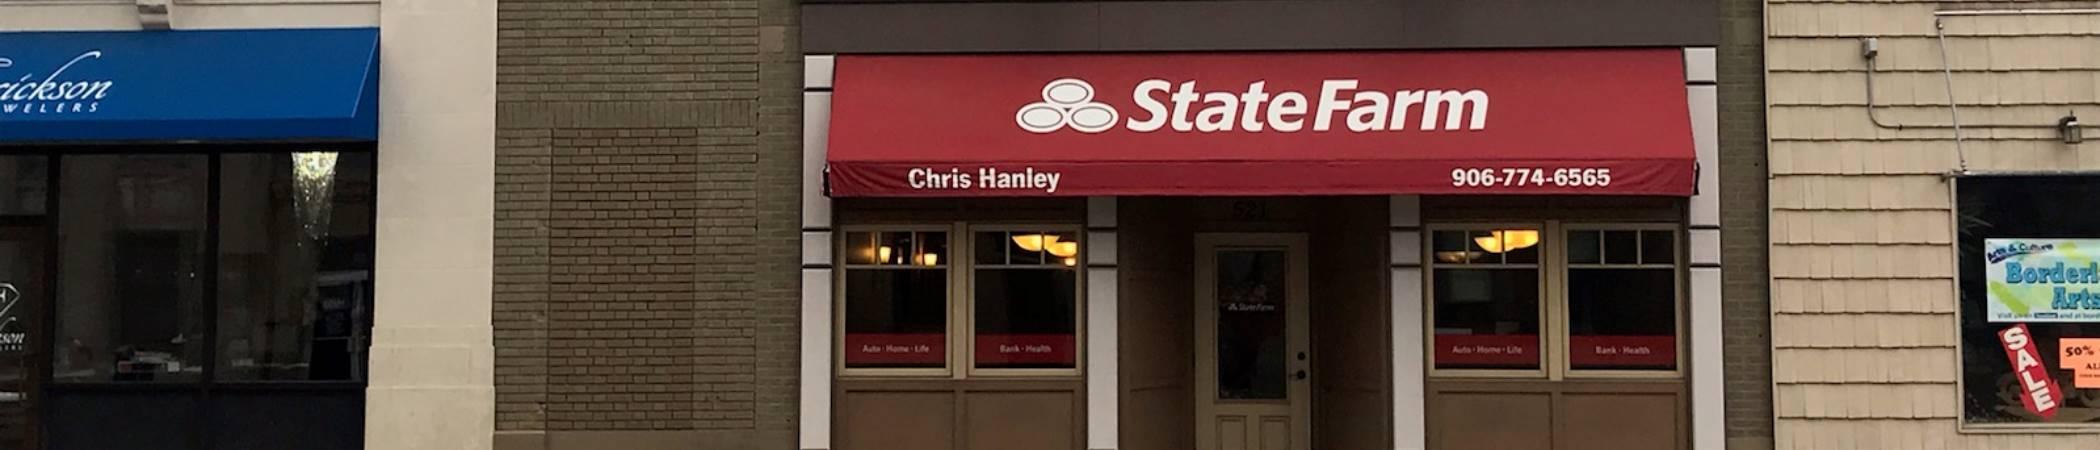 State Farm Insurance Agent Chris Hanley in Iron Mountain MI